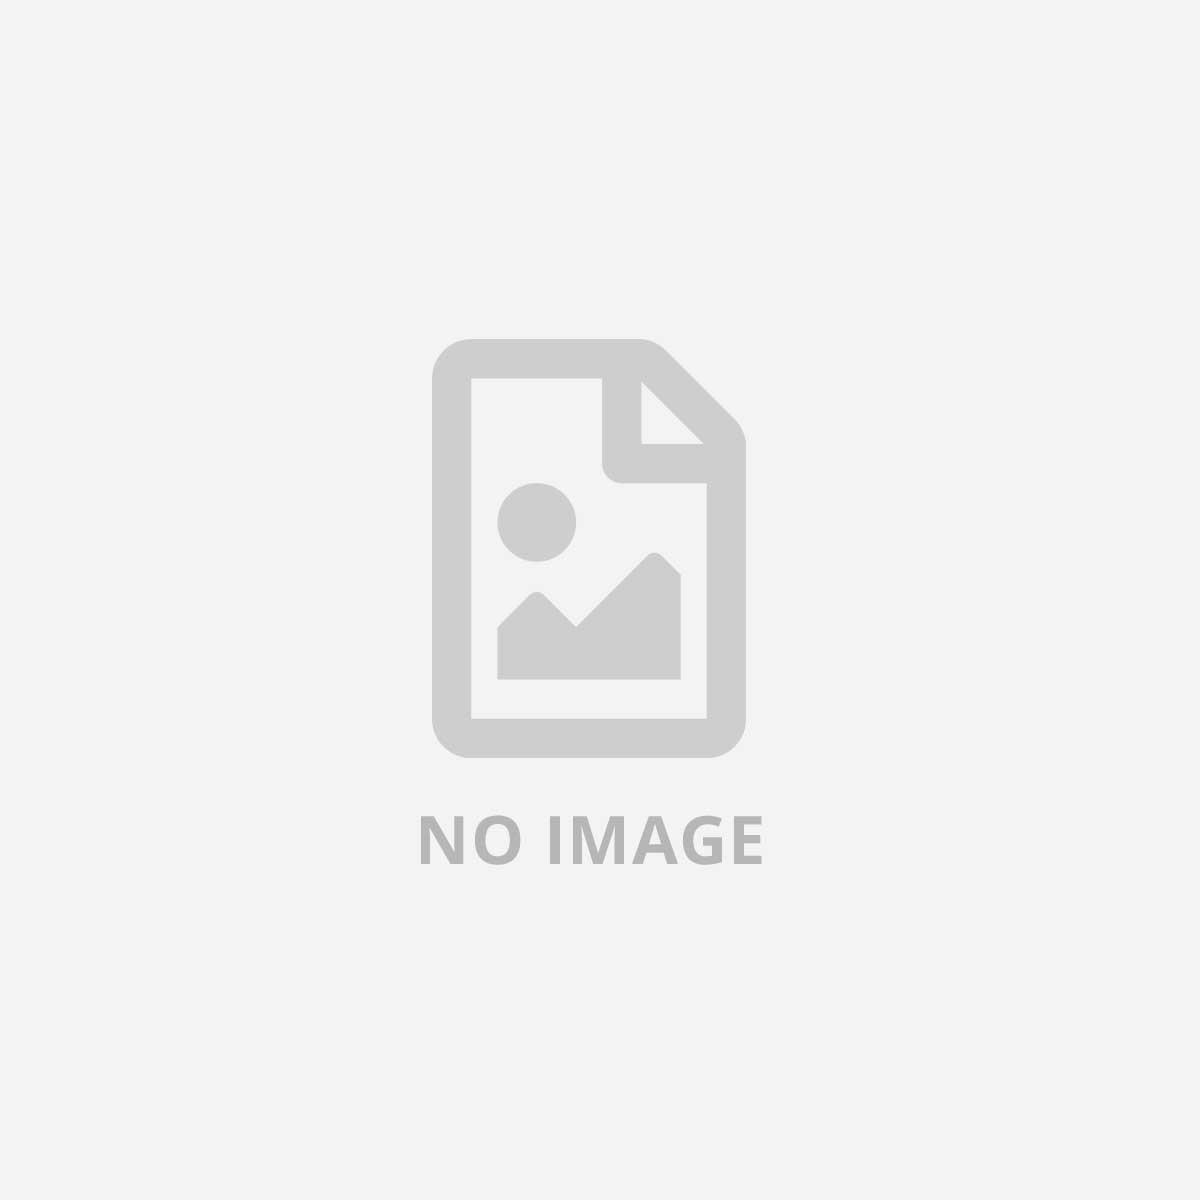 NILOX MONITOR LED 19.5 VGA HD VESA100